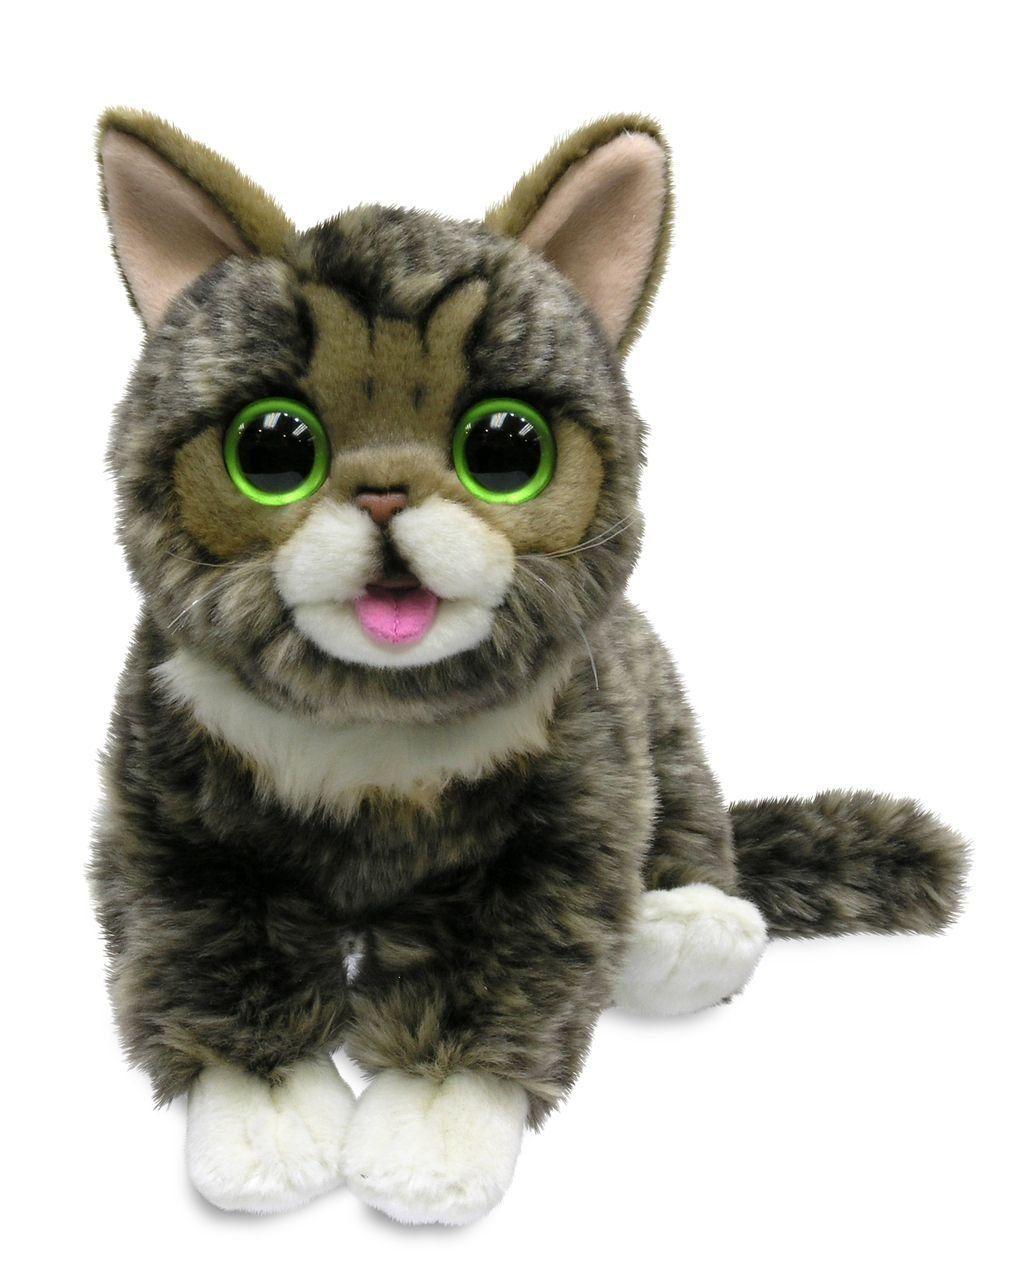 Amazon Com Cuddle Barn Lil Bub Adorable Kitten Cat Plush Toy Cb8240 Toys Games Lilbub Cat Plush Toy Cat Plush Kitten Toys